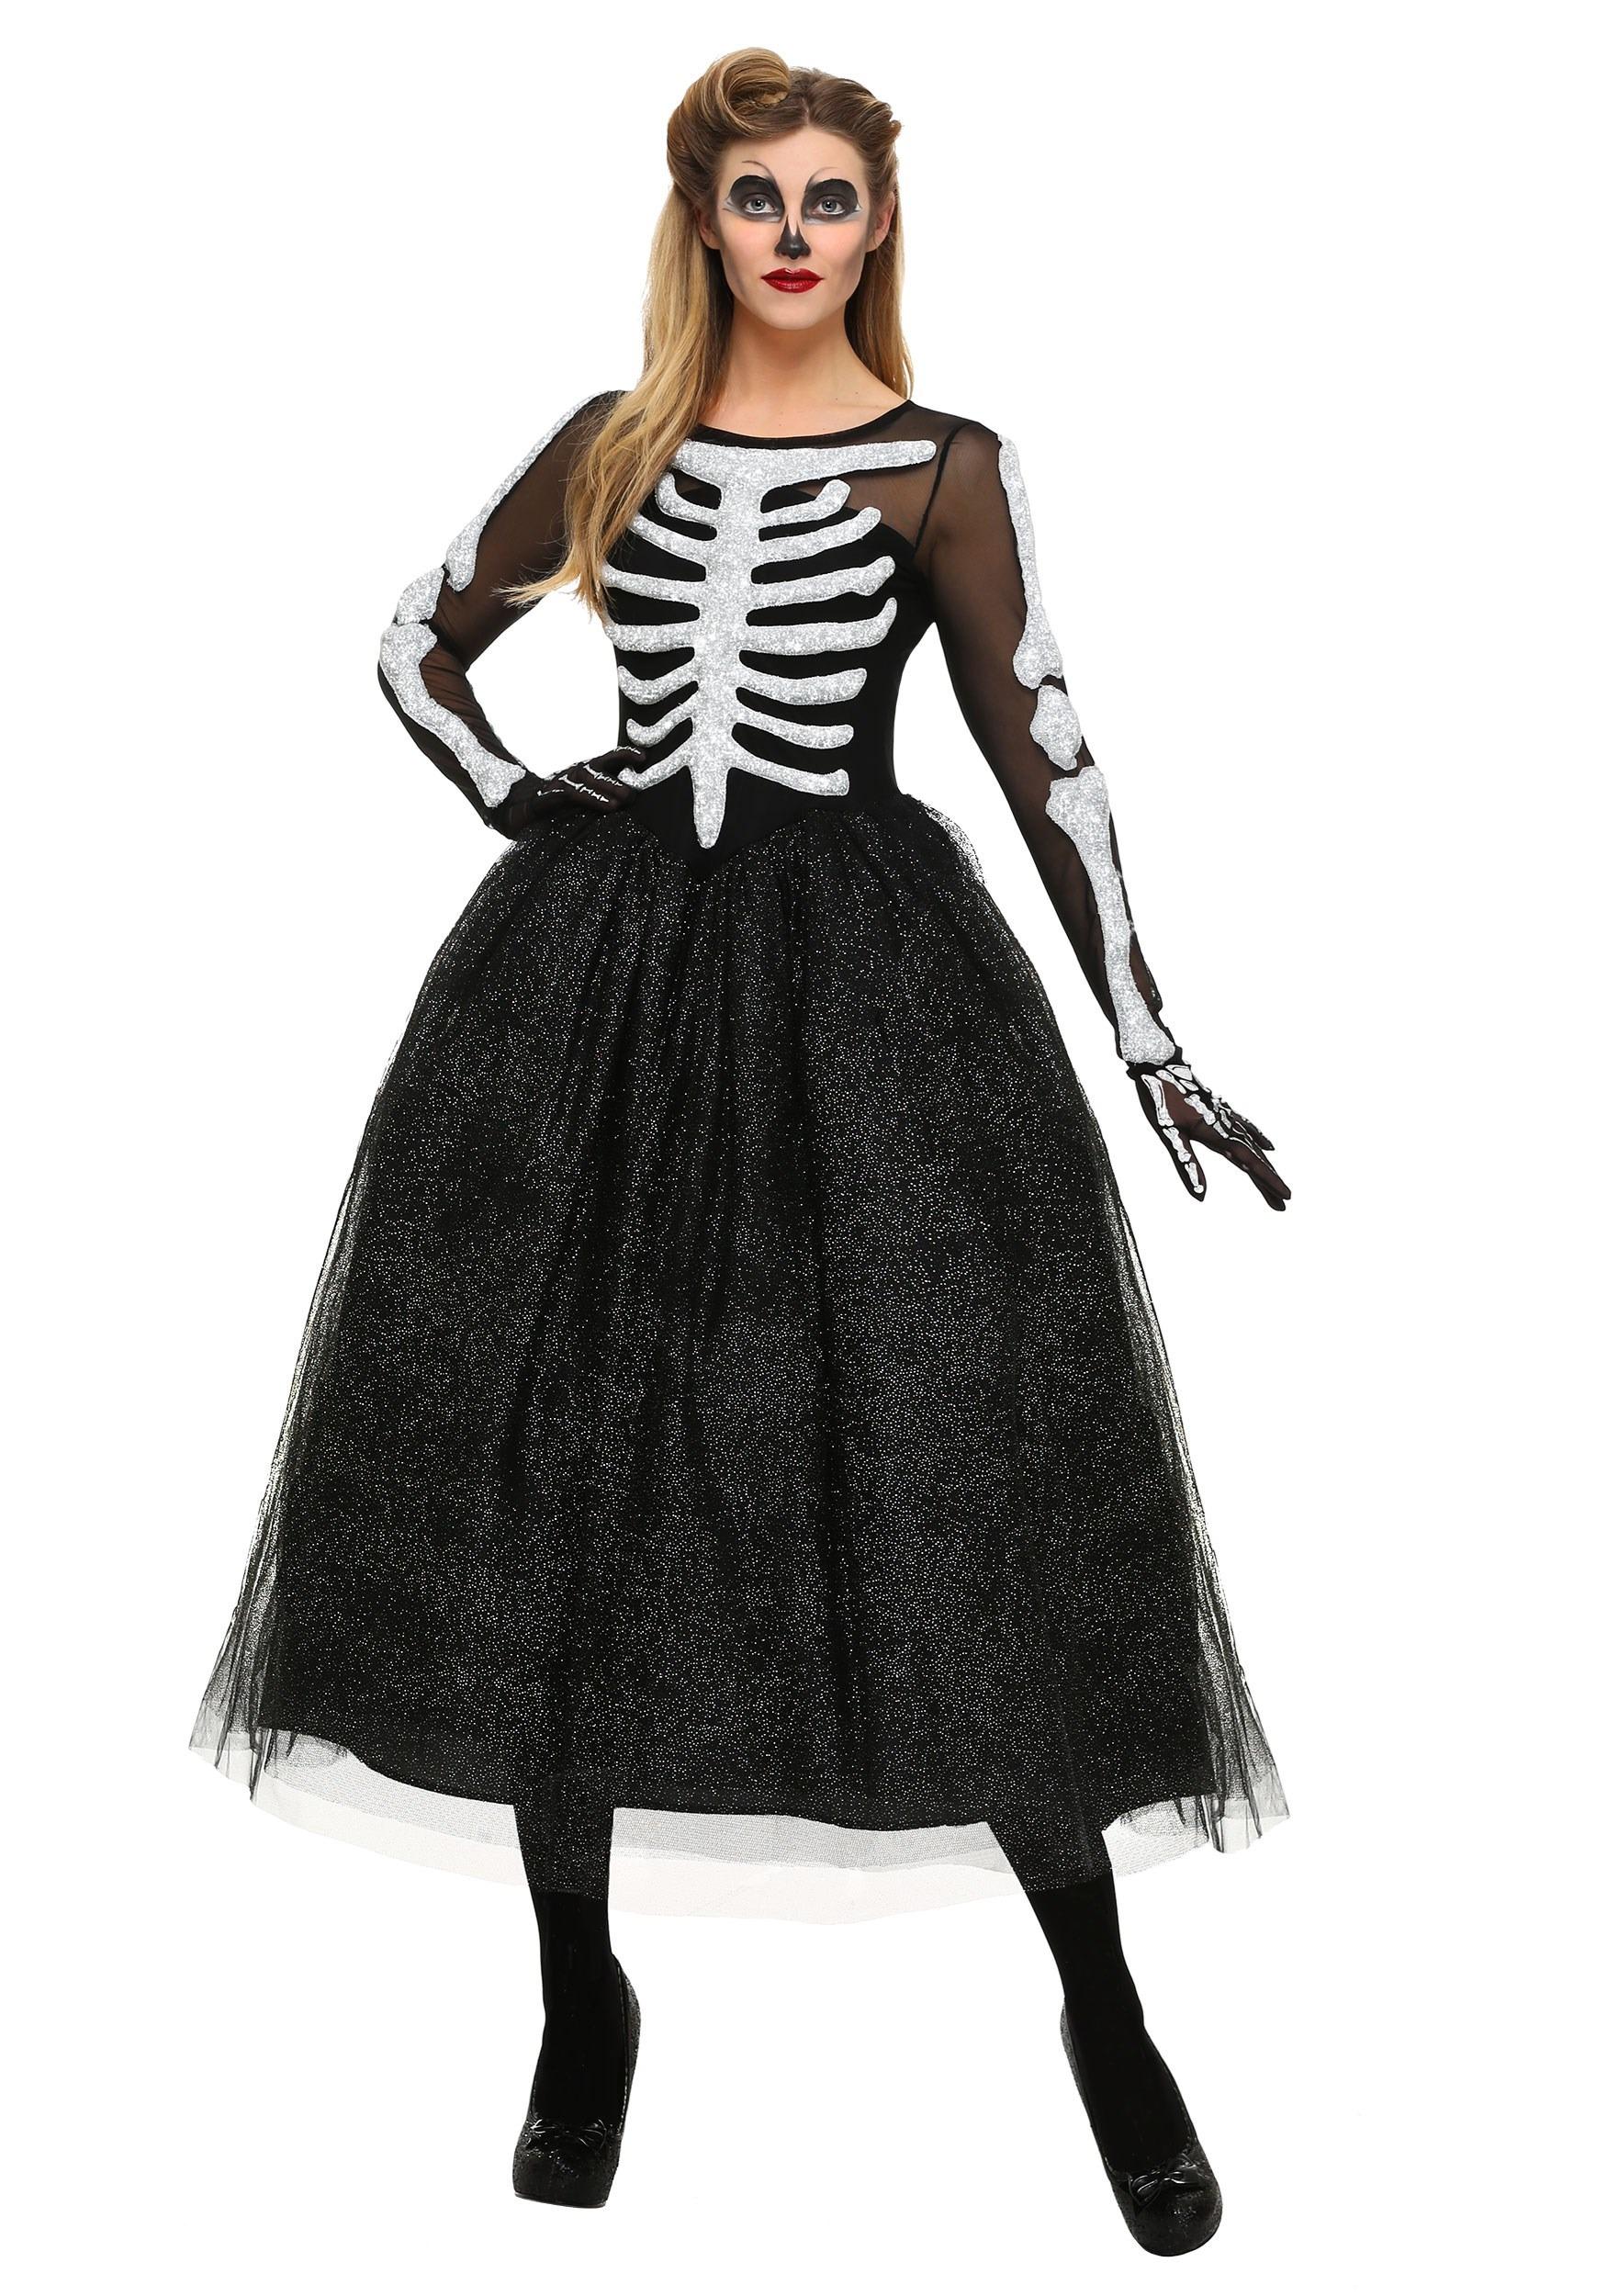 Skeleton Beauty Plus Size Costume for Women